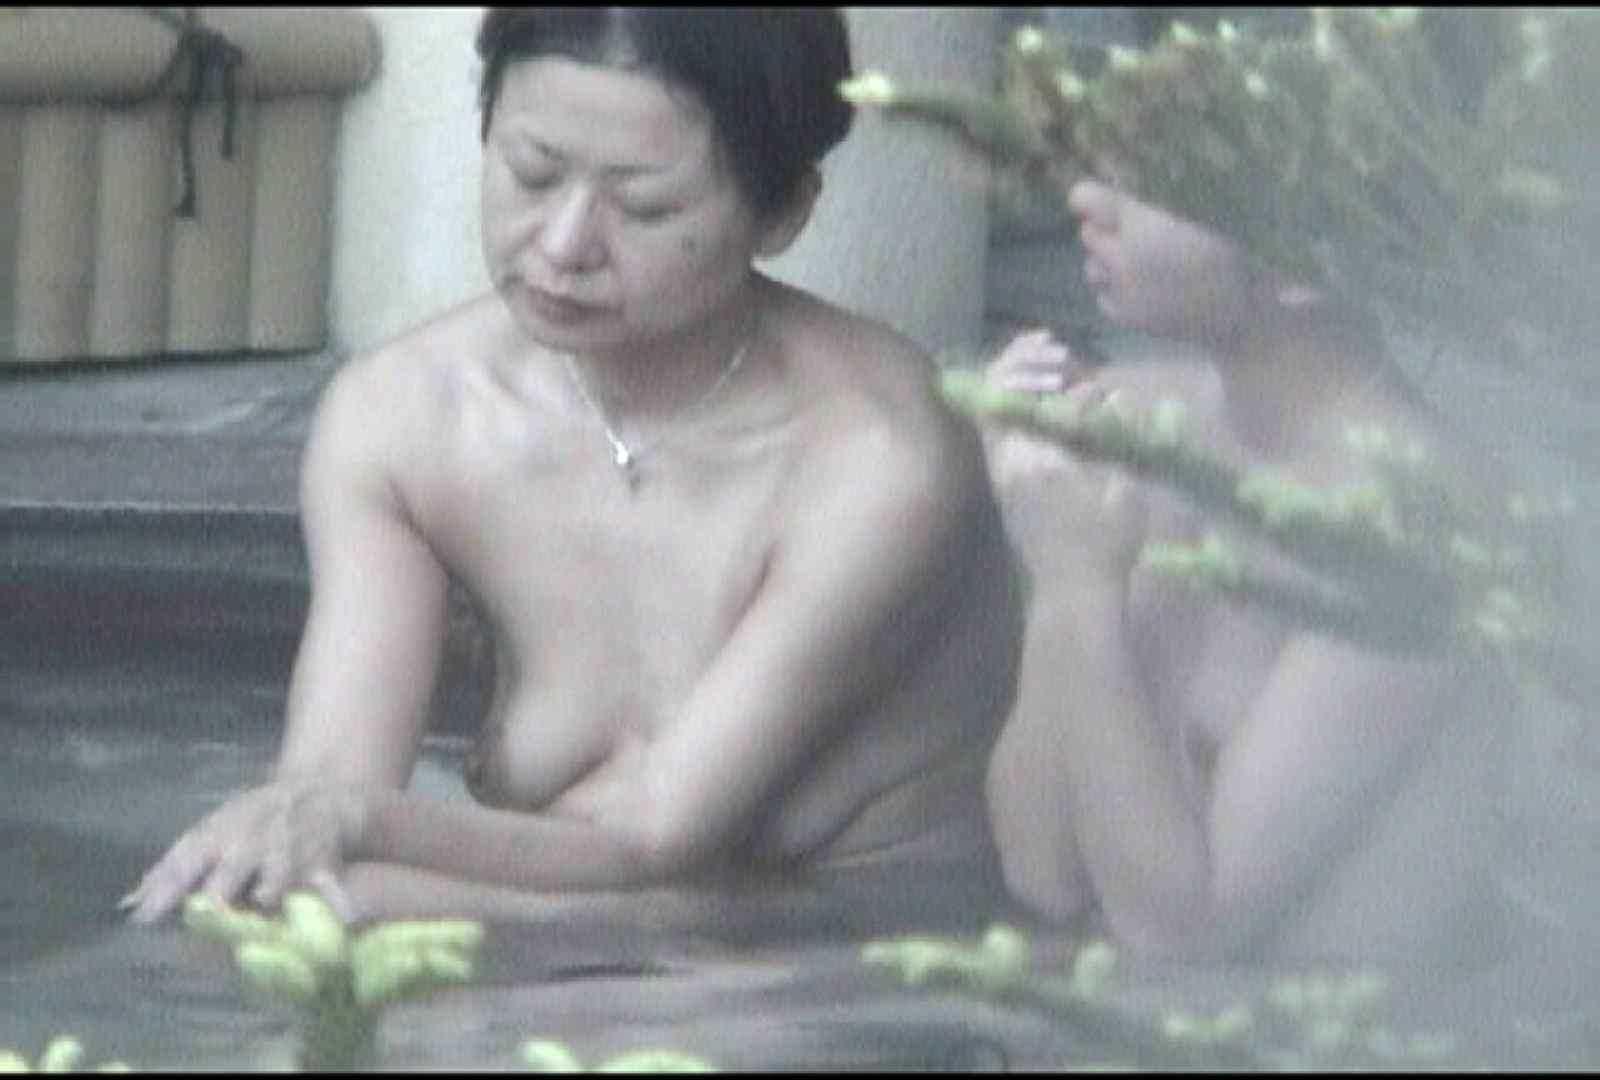 Aquaな露天風呂Vol.15 盗撮映像  42Pix 30